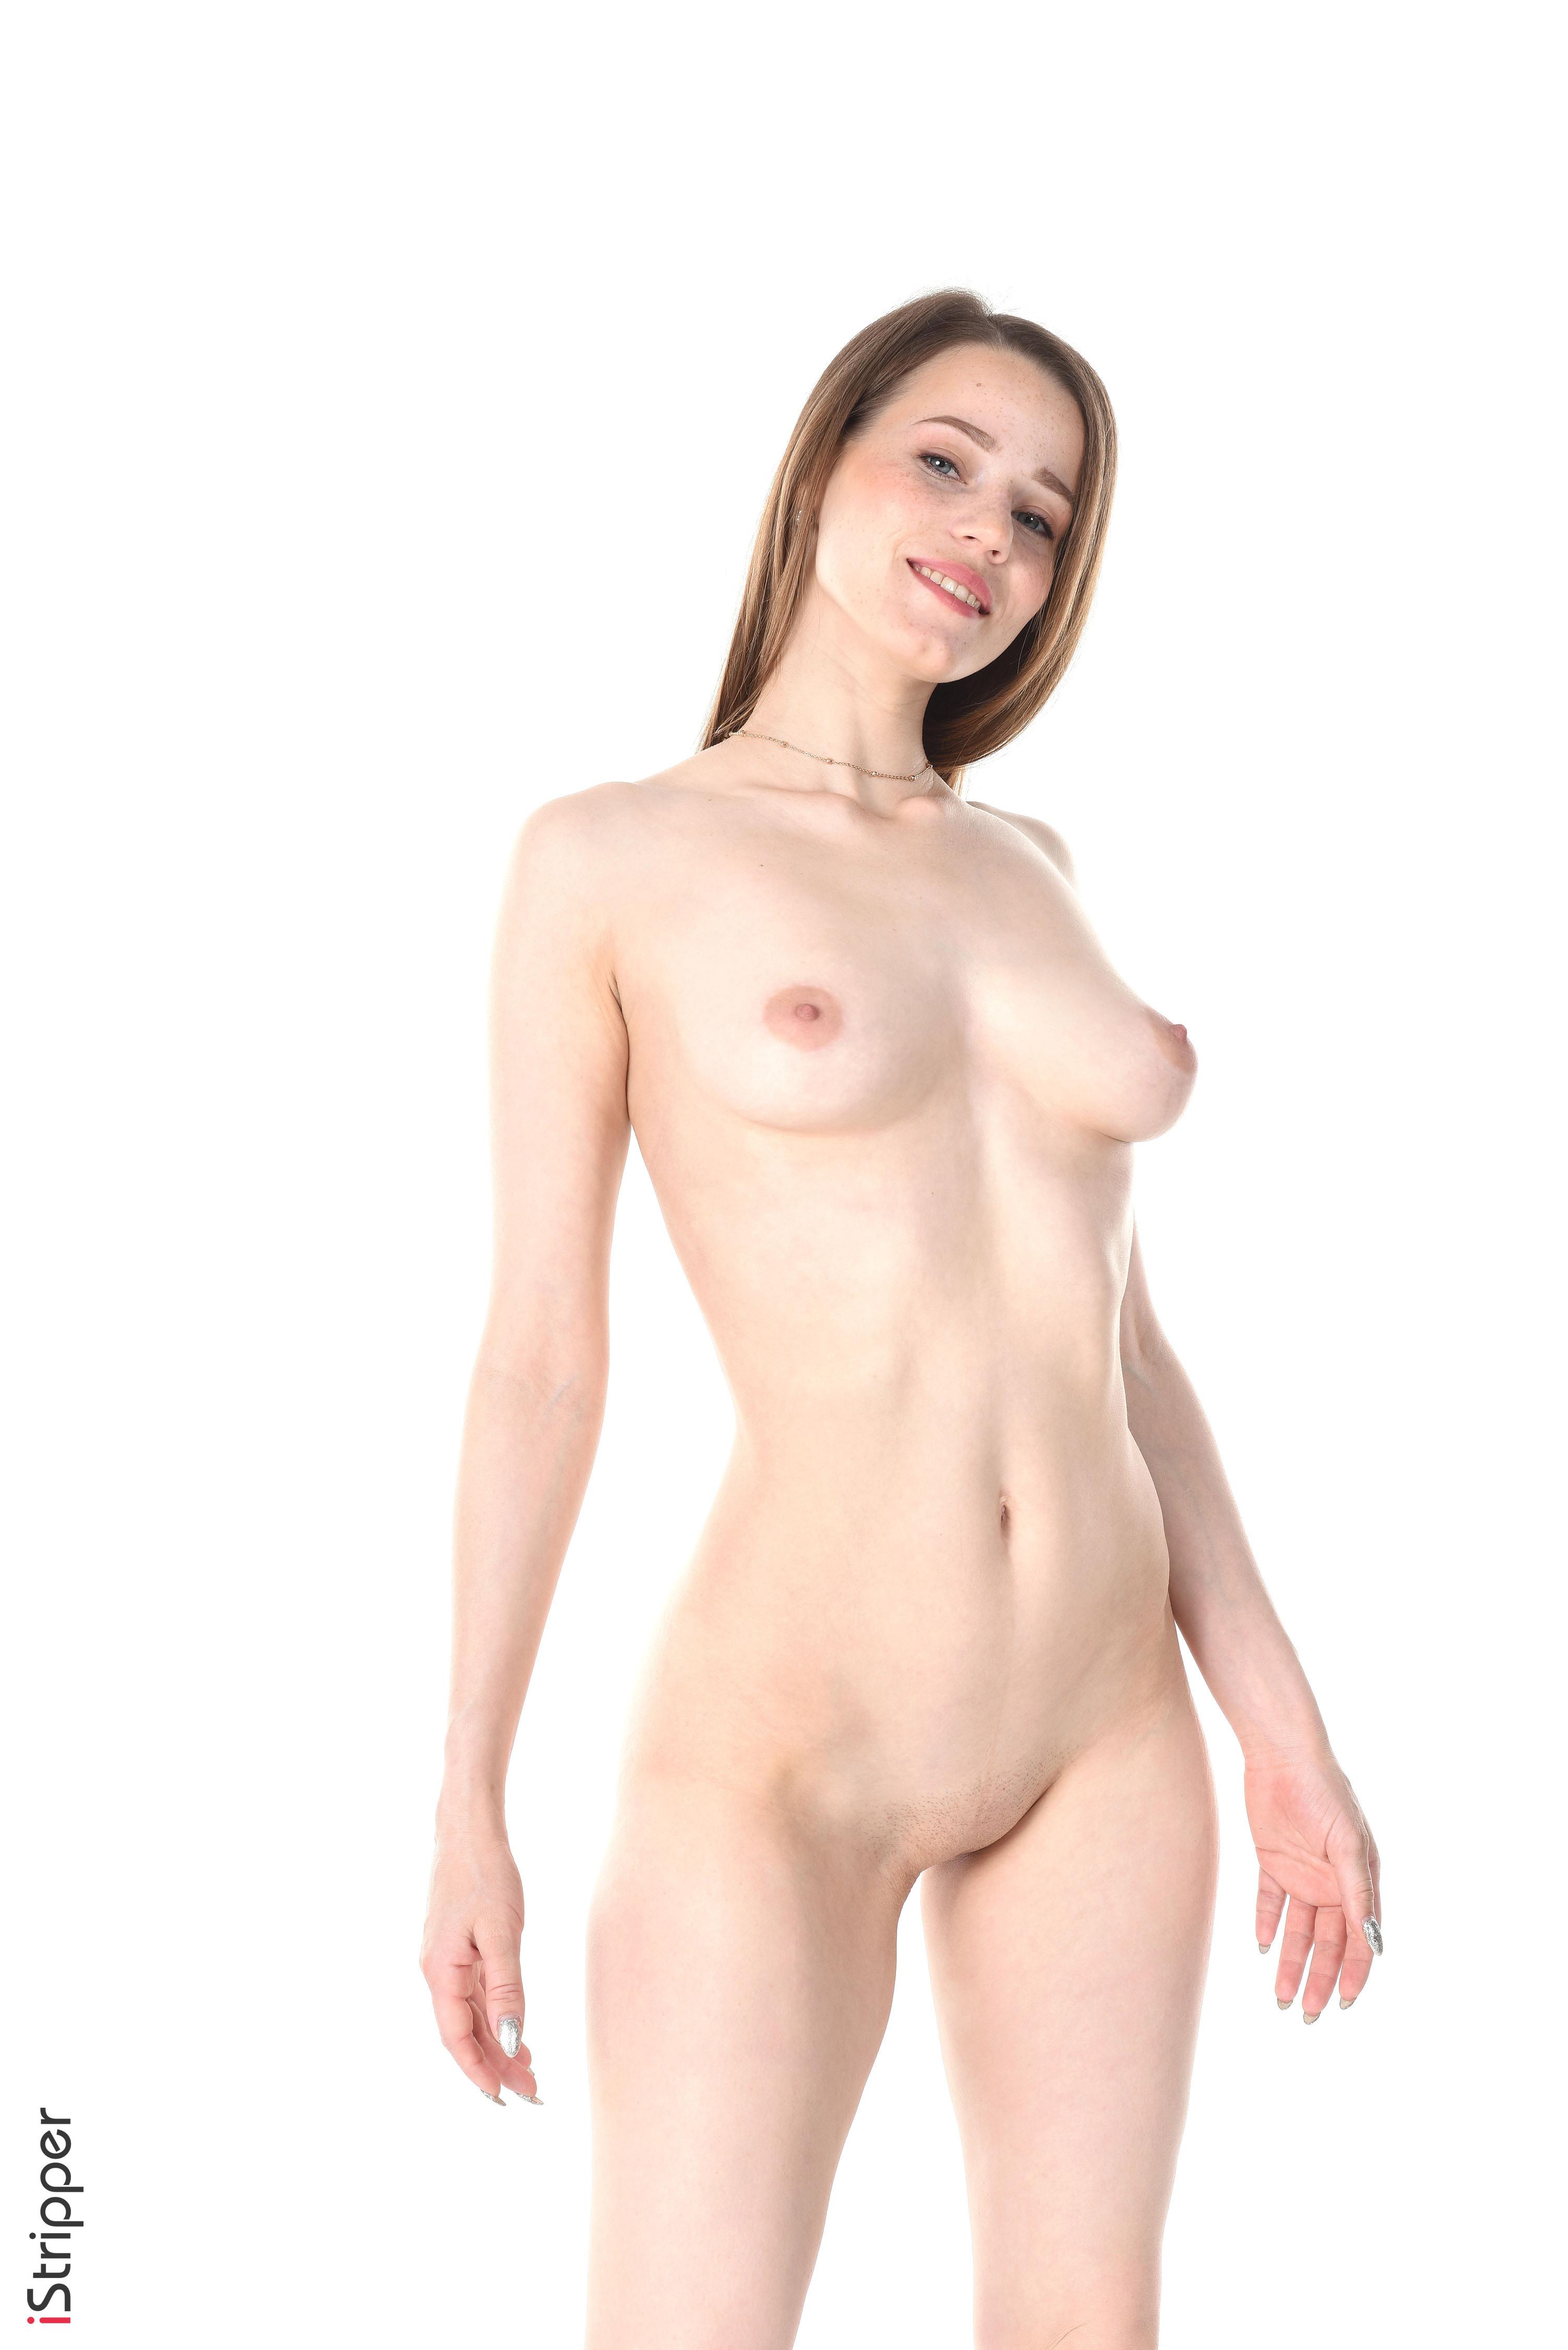 live nude wallpaper